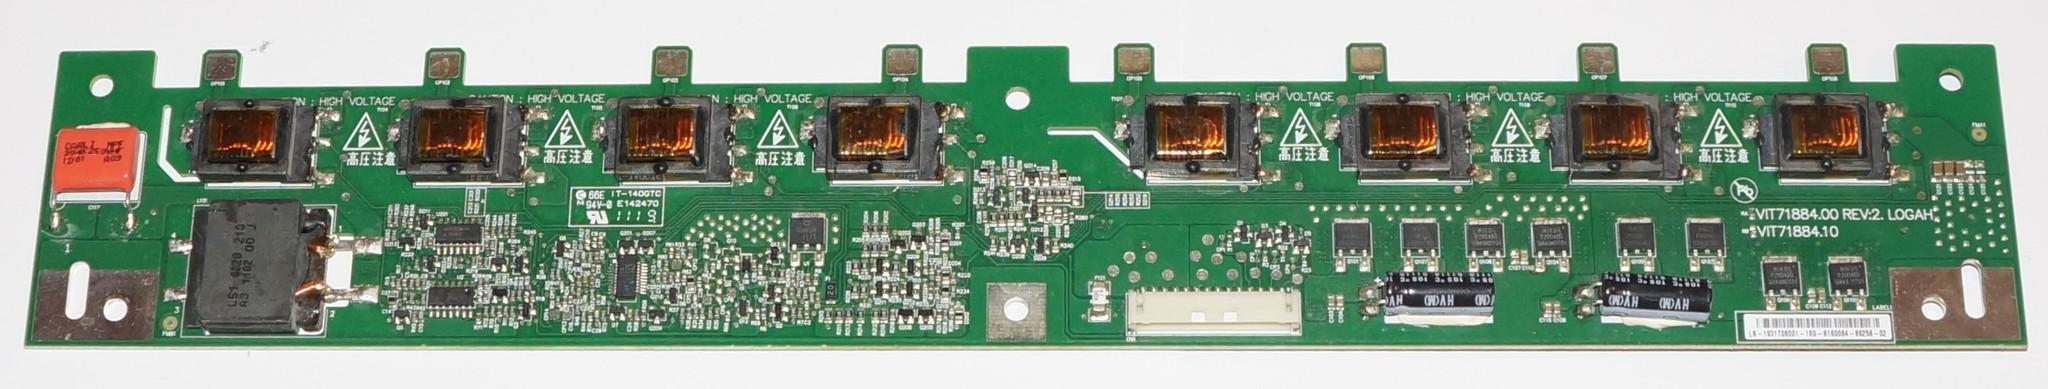 VIT71884.00 инвертор (inverter)  REV:2 LOGAH телевизора LG UE32H6400AK купить